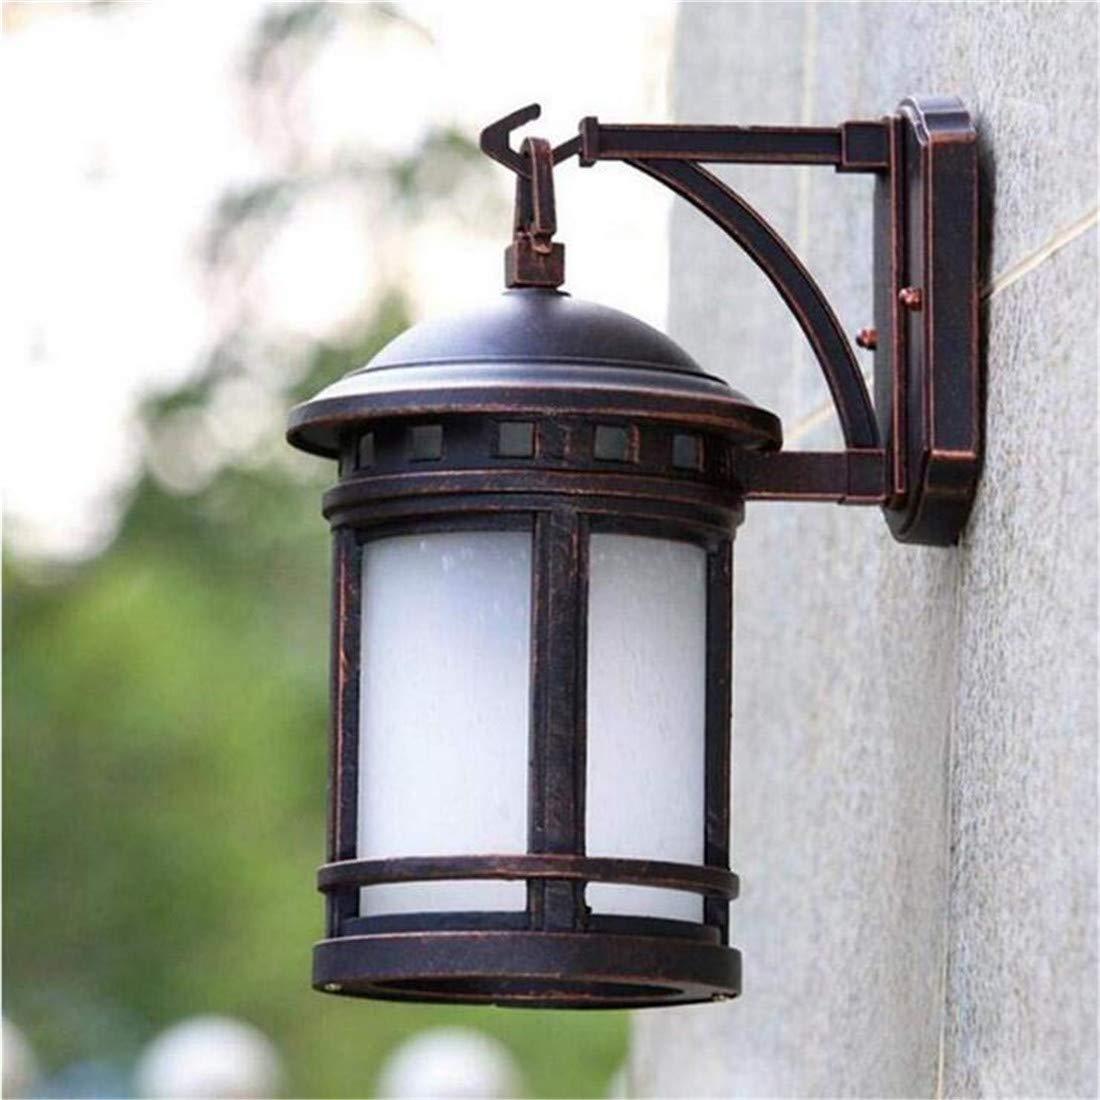 Lampada da parete per esterni Lampada da parete per esterni da balcone